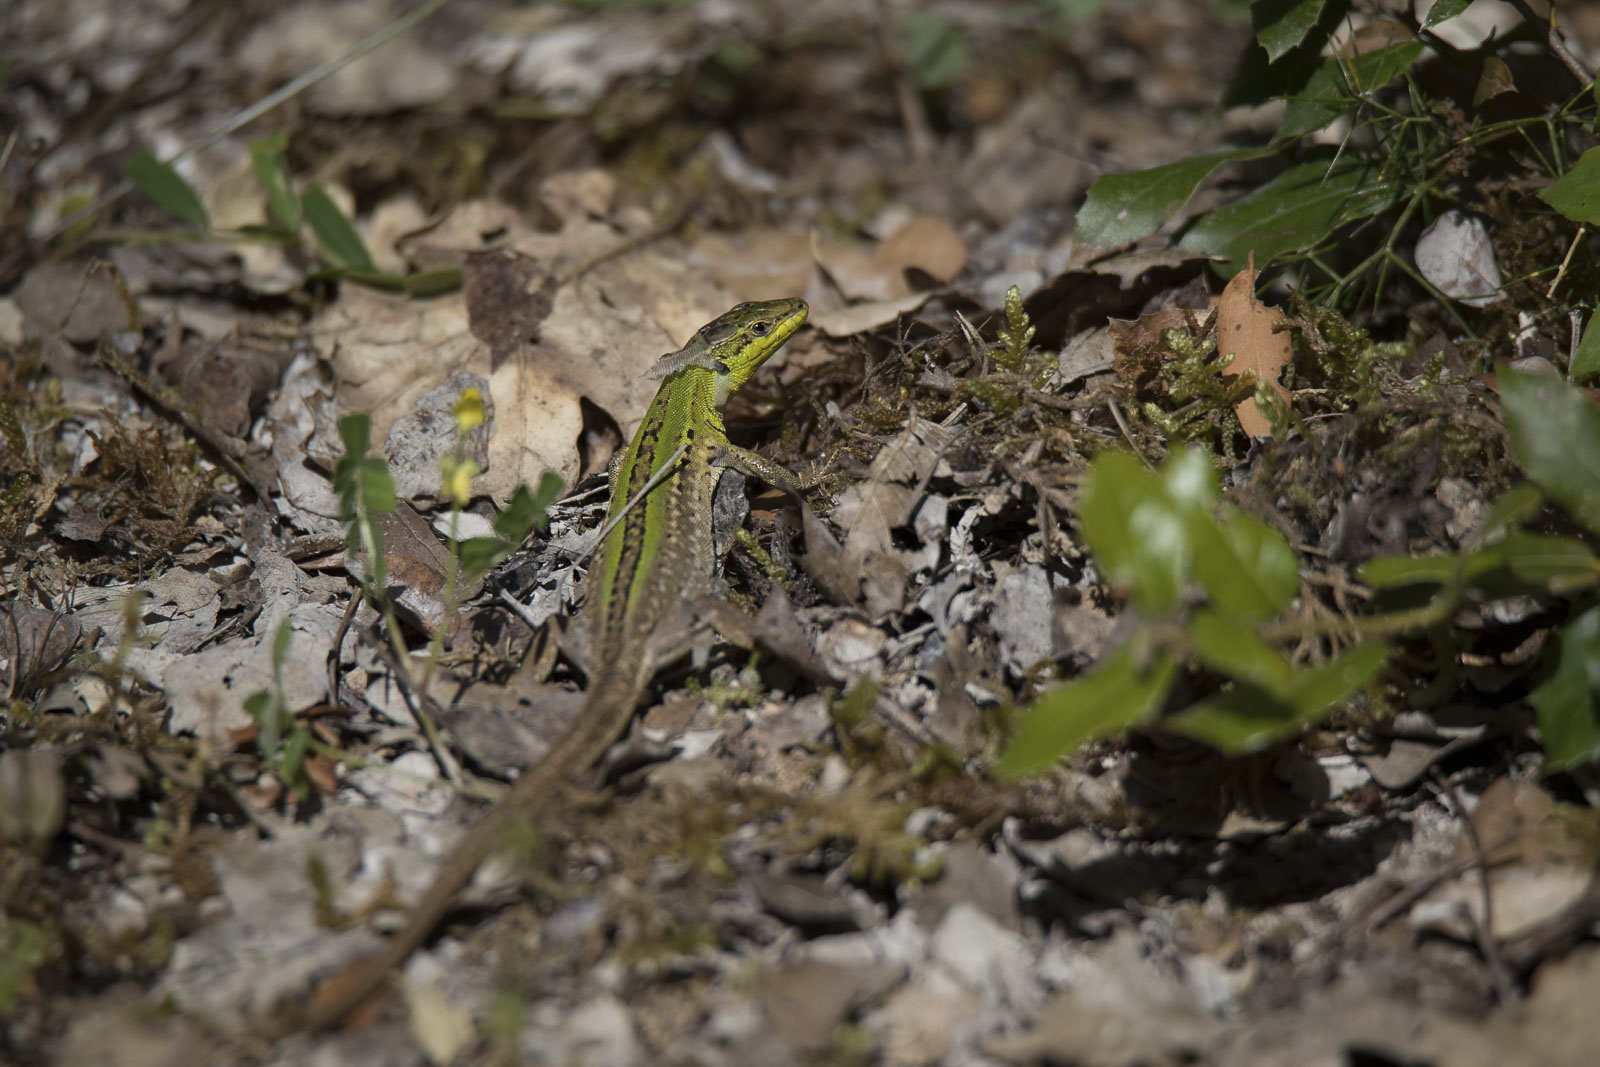 Lizard chaincheing skin